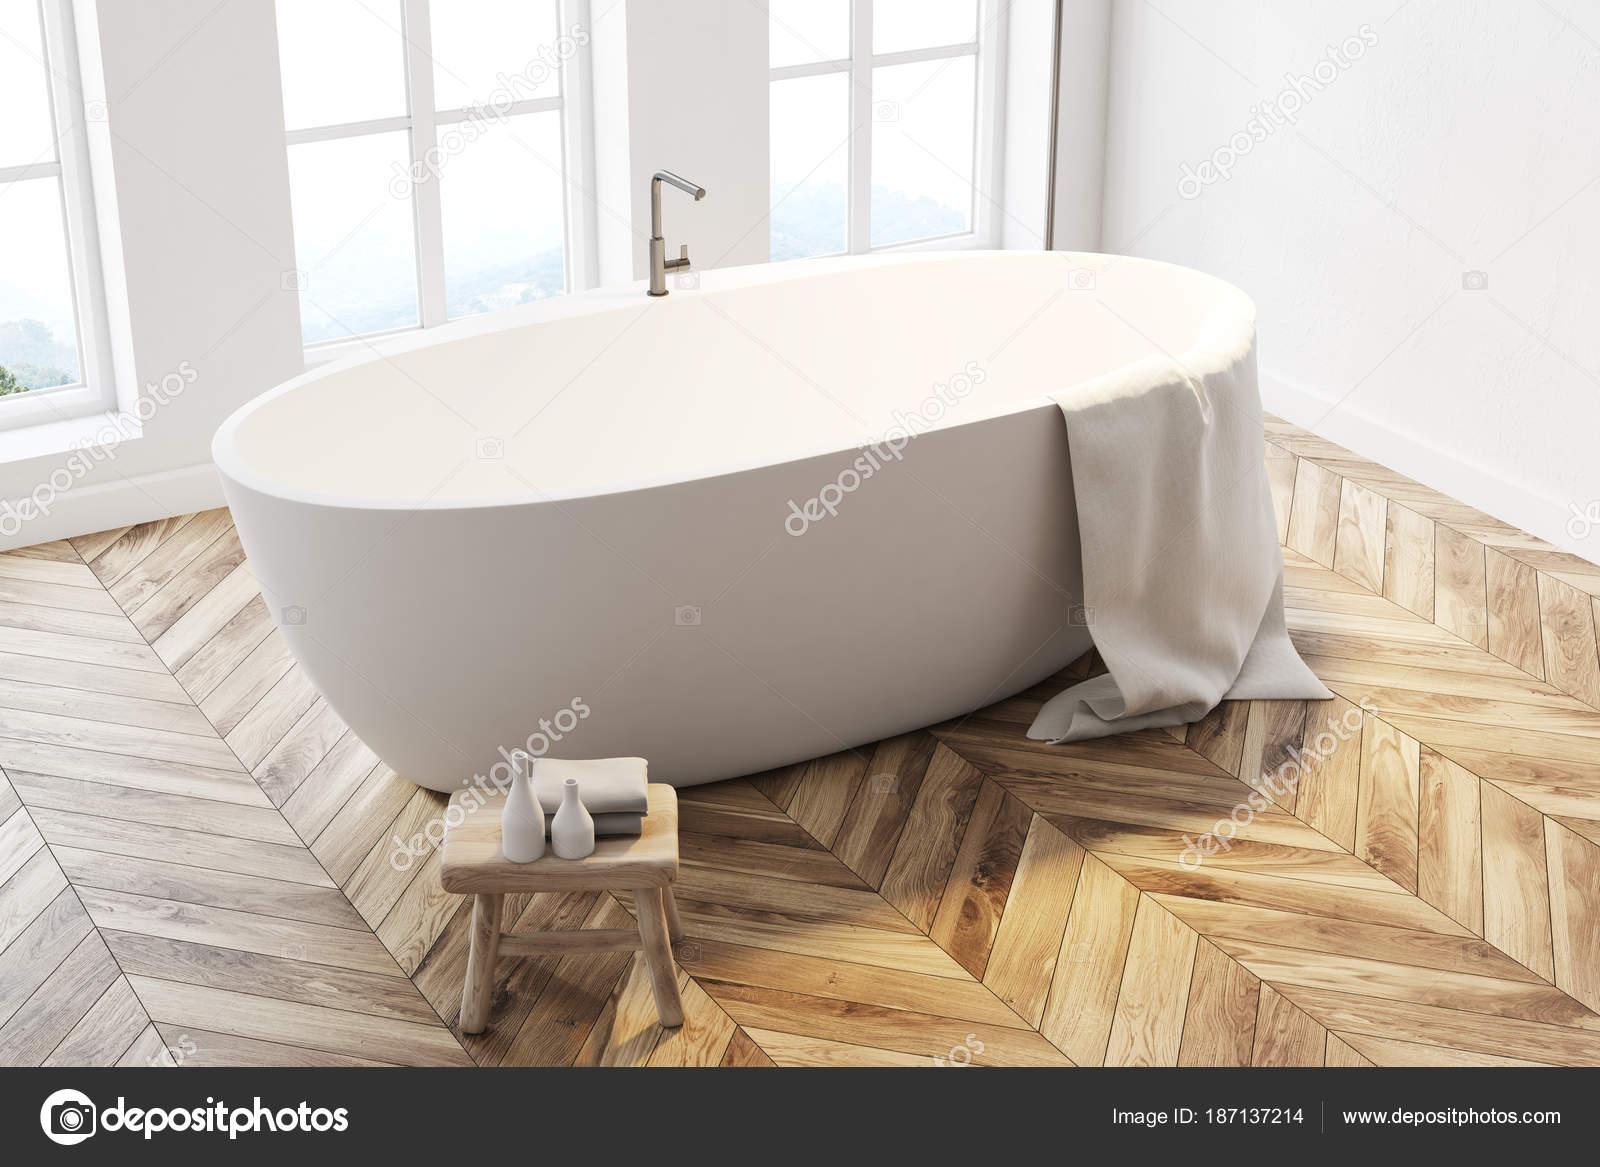 Vasca Da Bagno Vista : Vasca da bagno bianca vista dall alto u foto stock